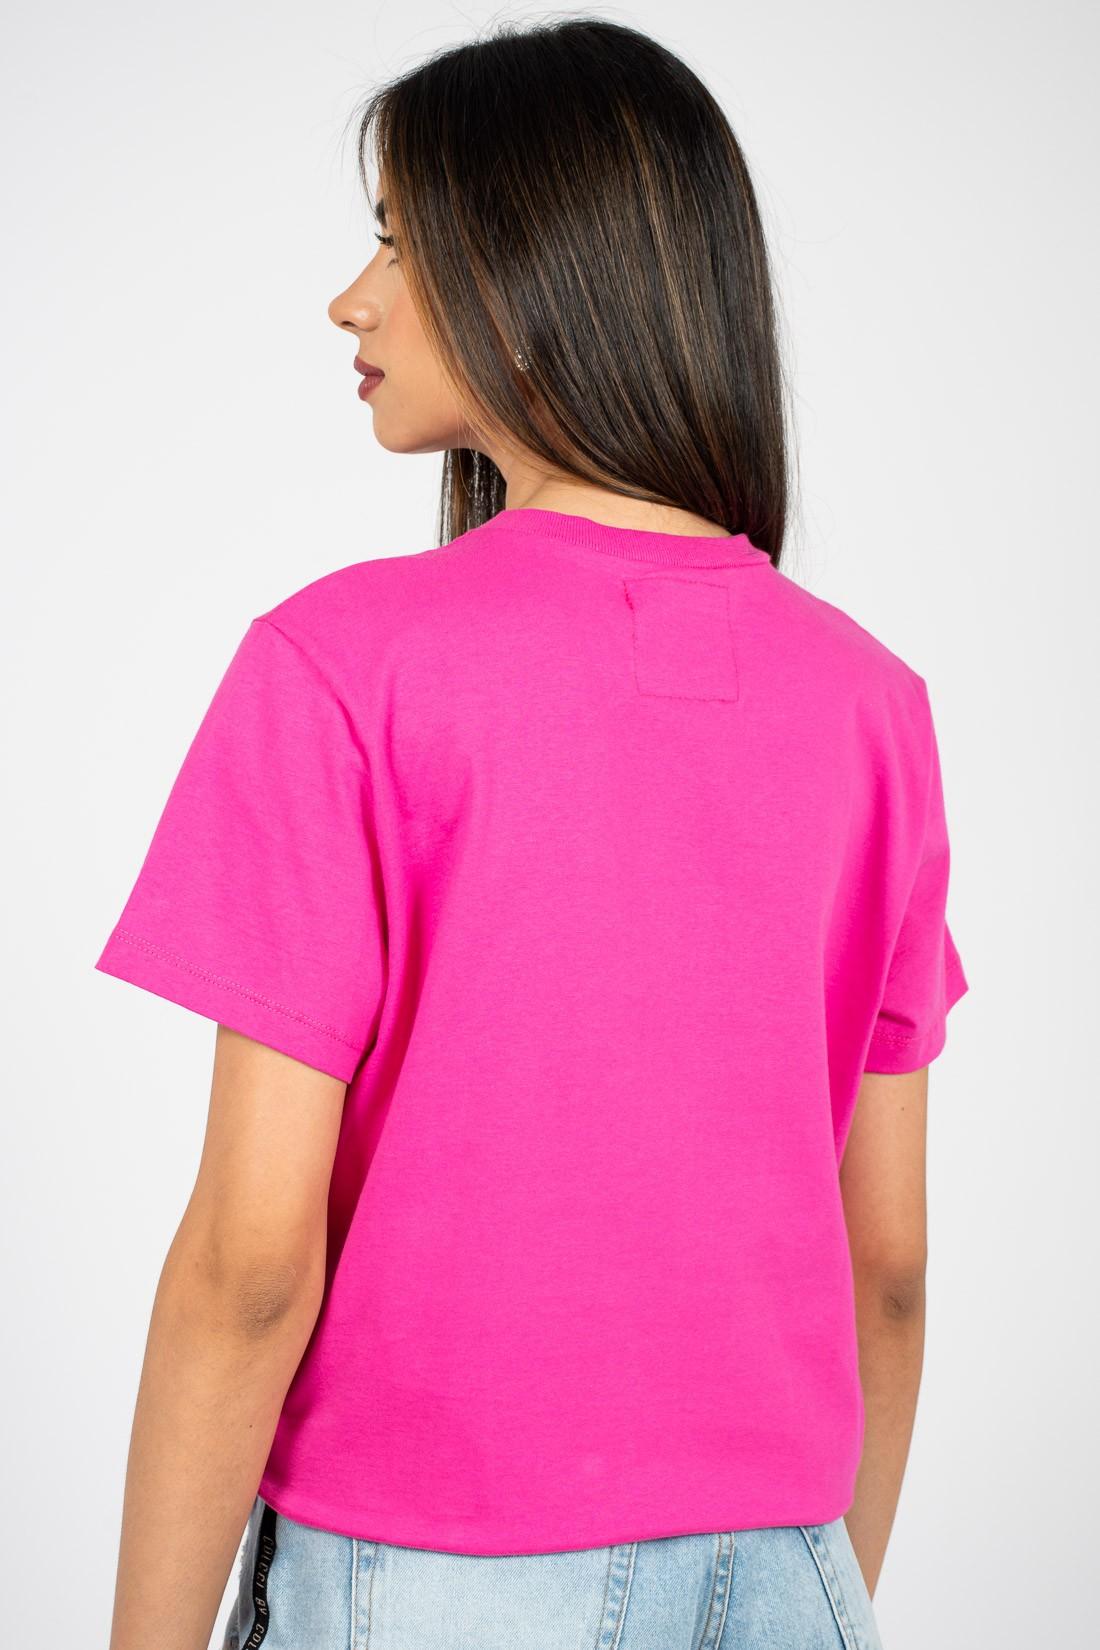 T Shirt Colcci Monday Friday